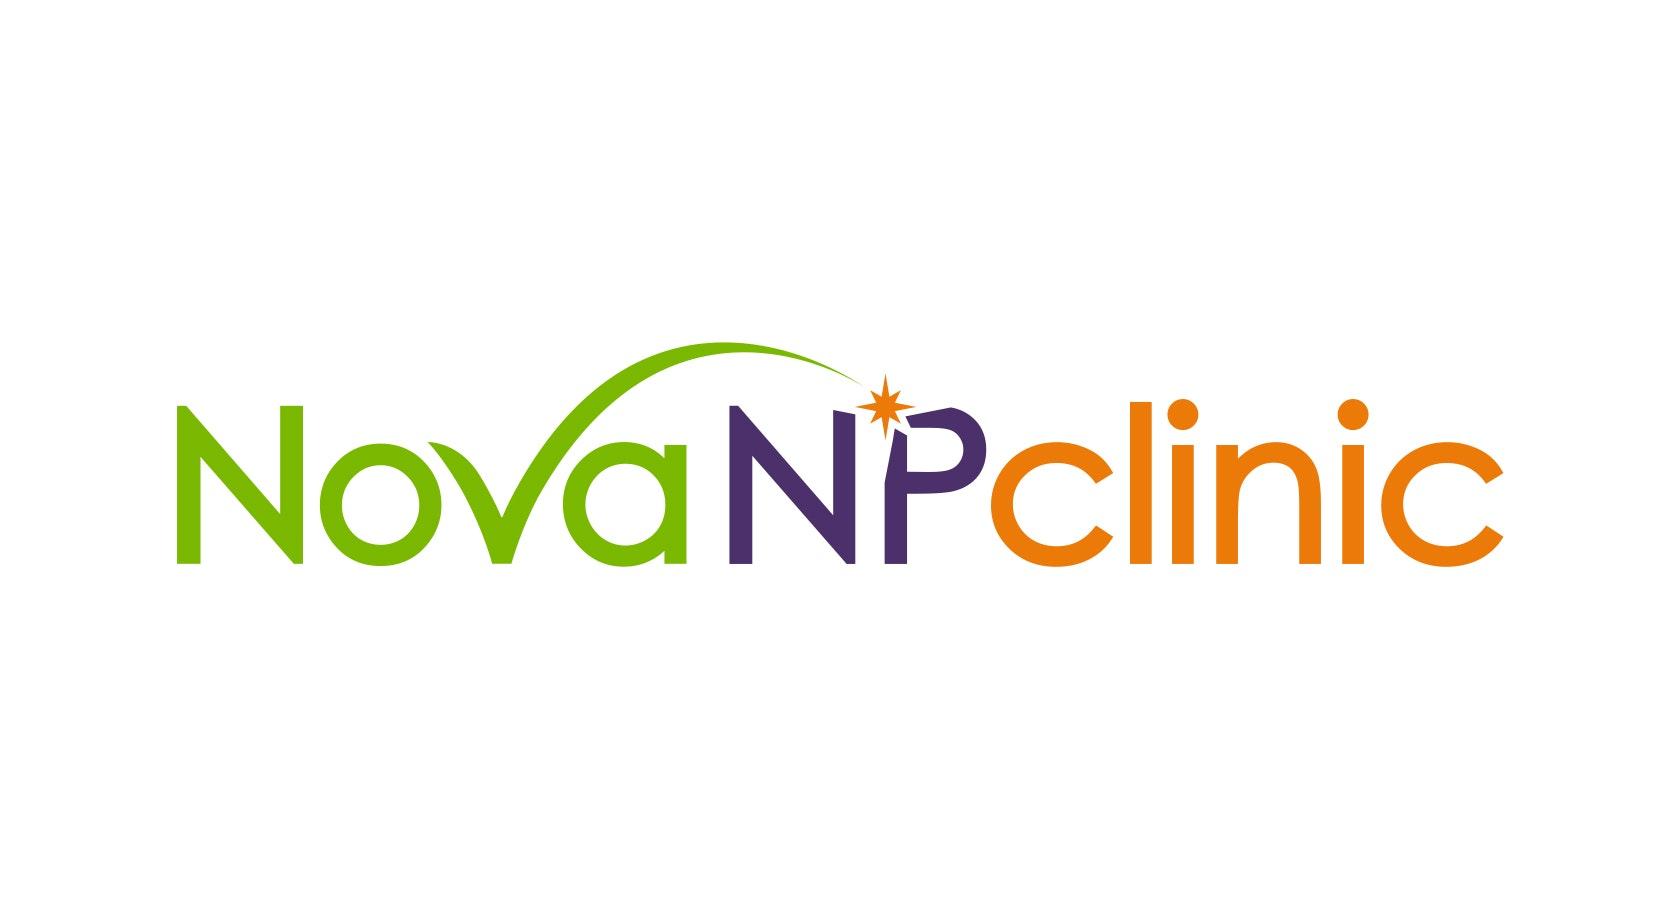 Nova NP Clinic